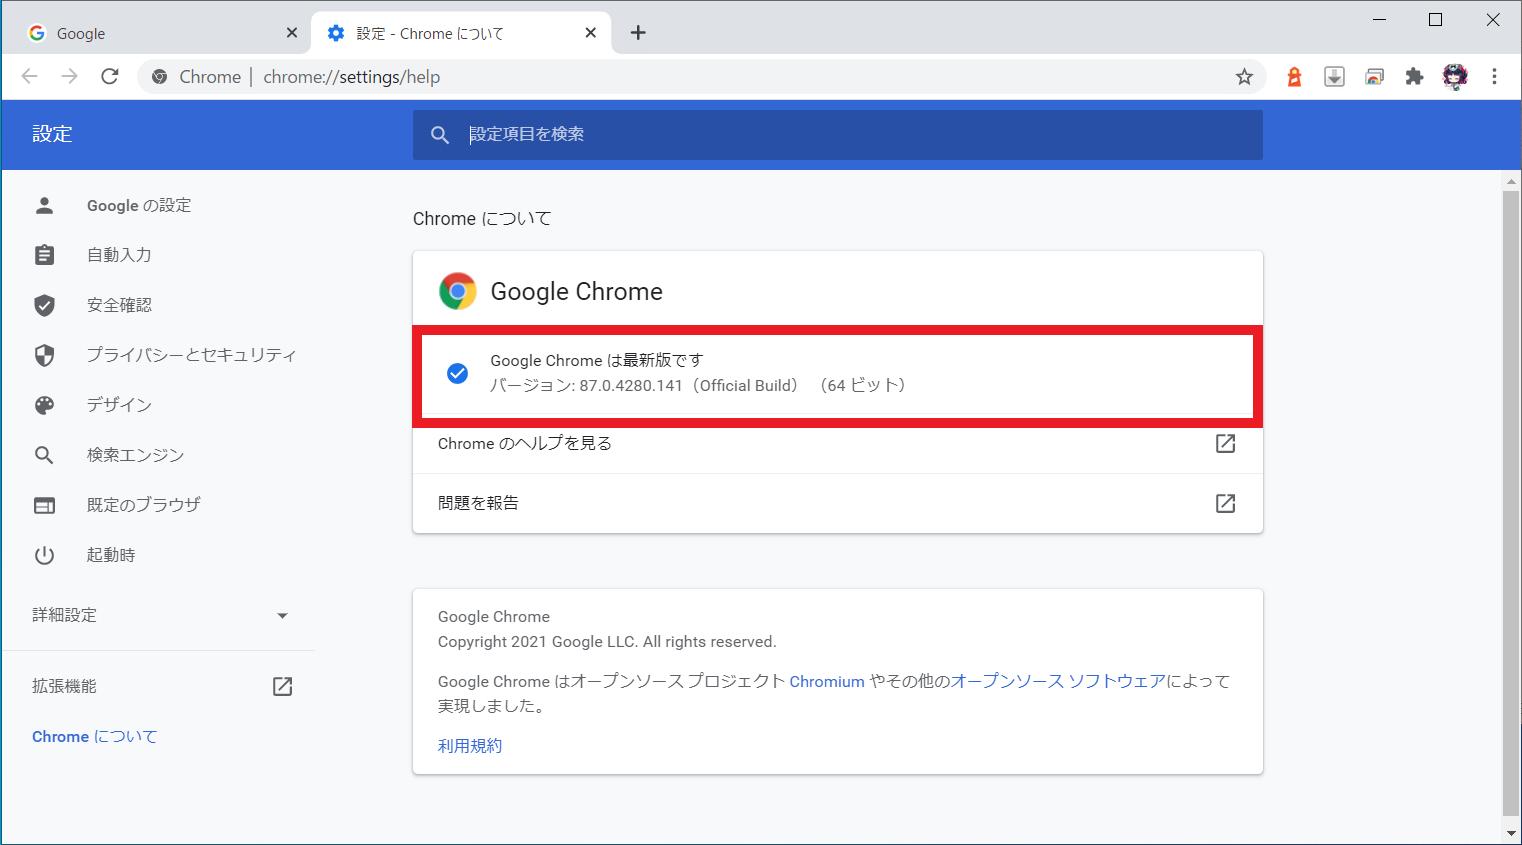 Google Chromeで右上に更新と表示された際の対応方法【アップデート】